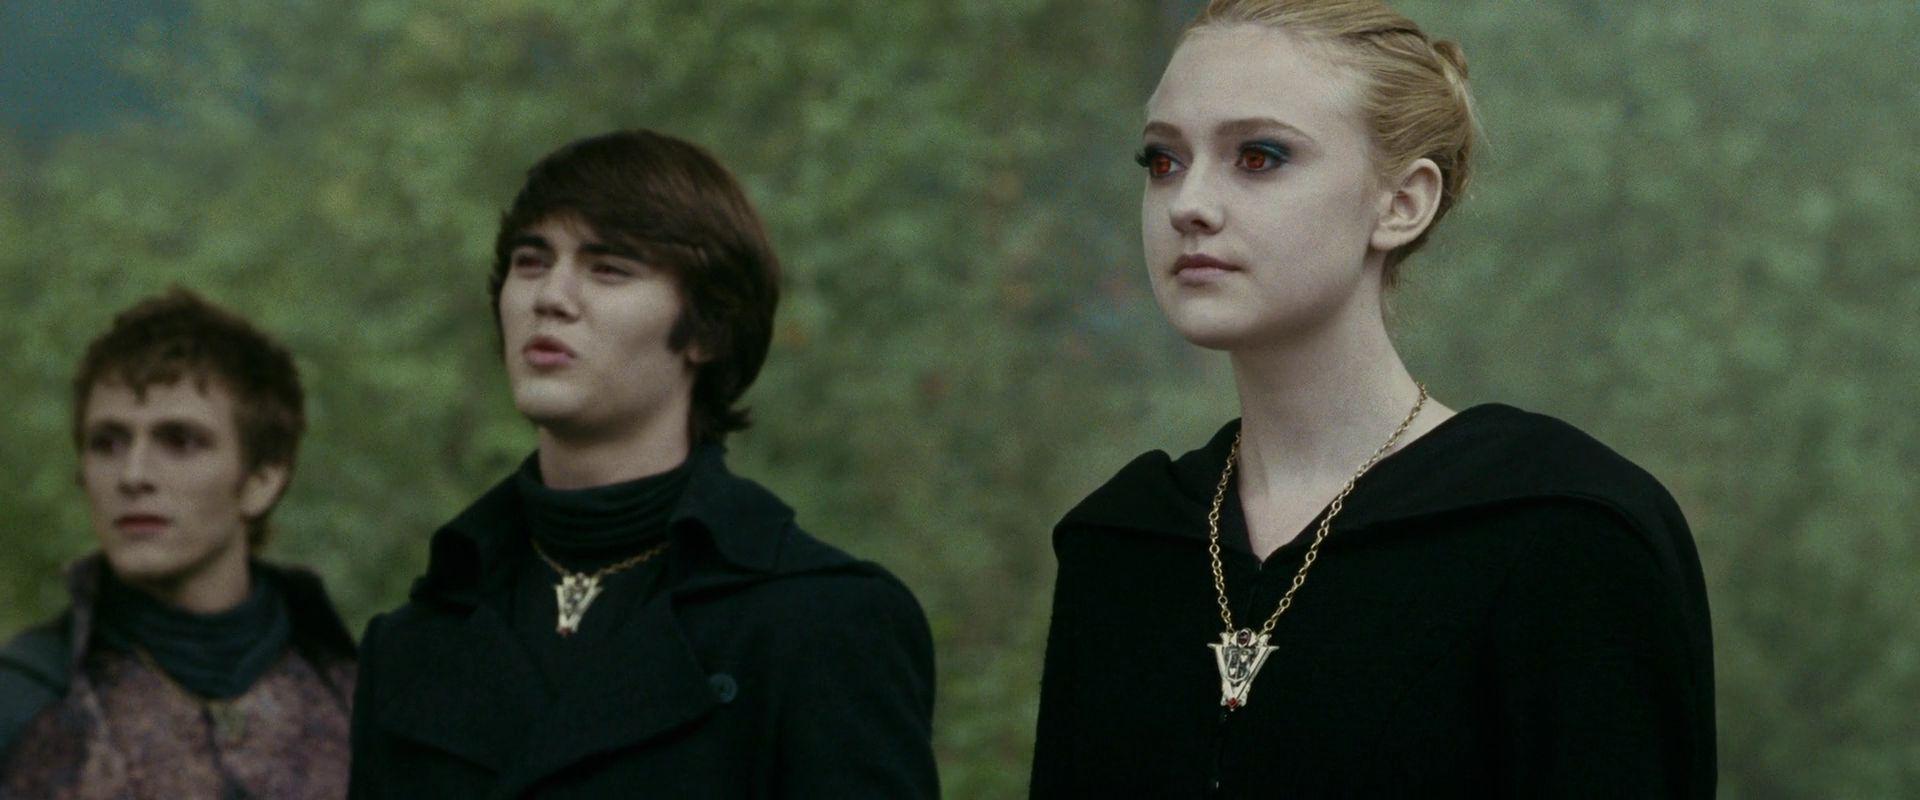 Alec - Eclipse HQ Auszeichnungen - Alec of the Volturi Image